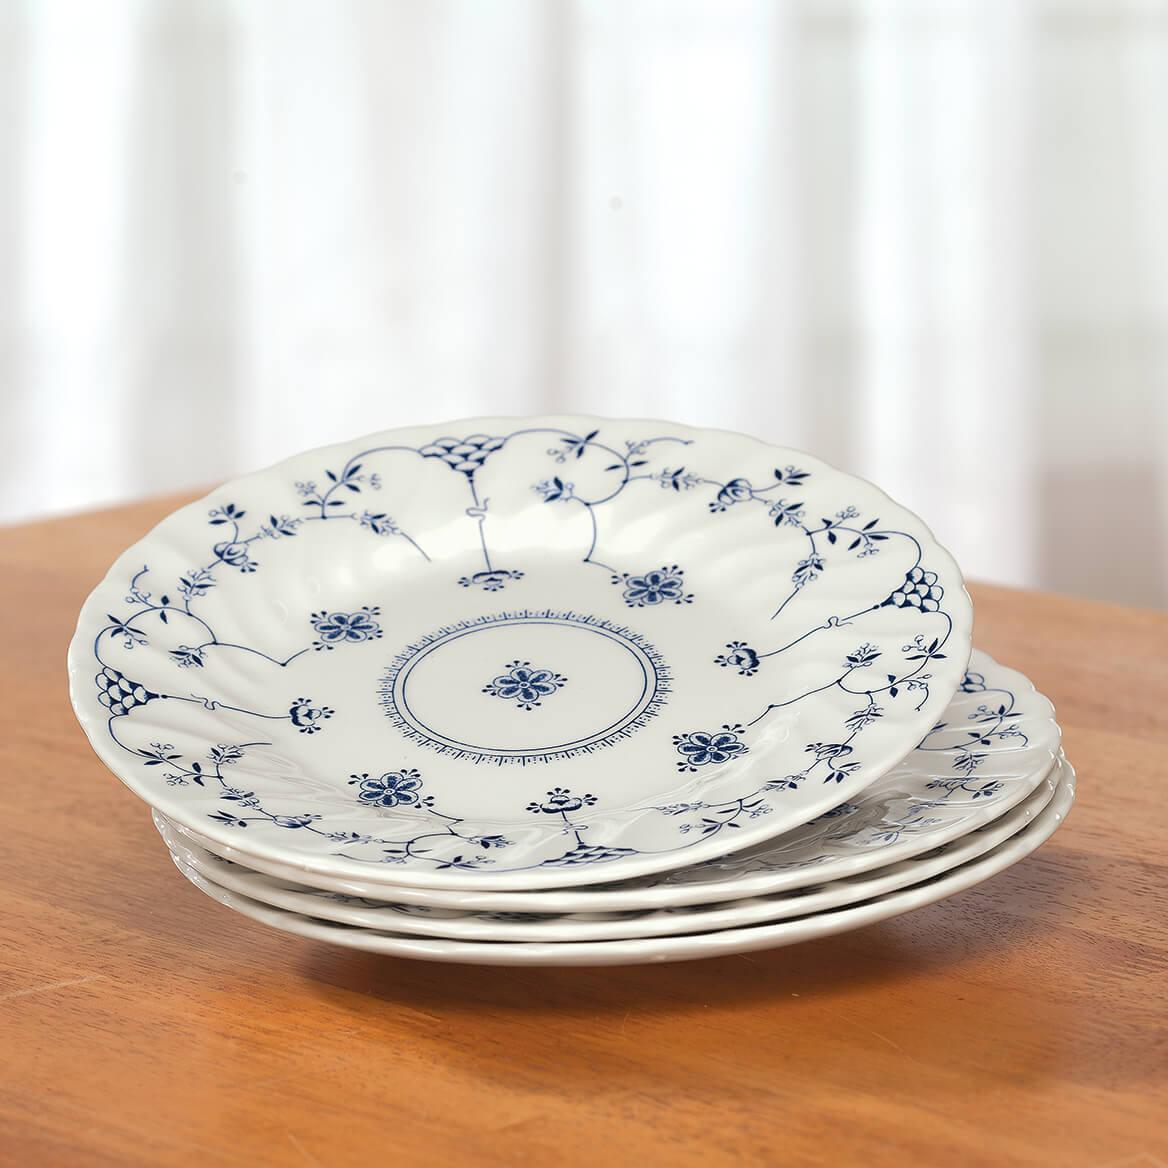 Finlandia Set of 4 Salad Plates-368569